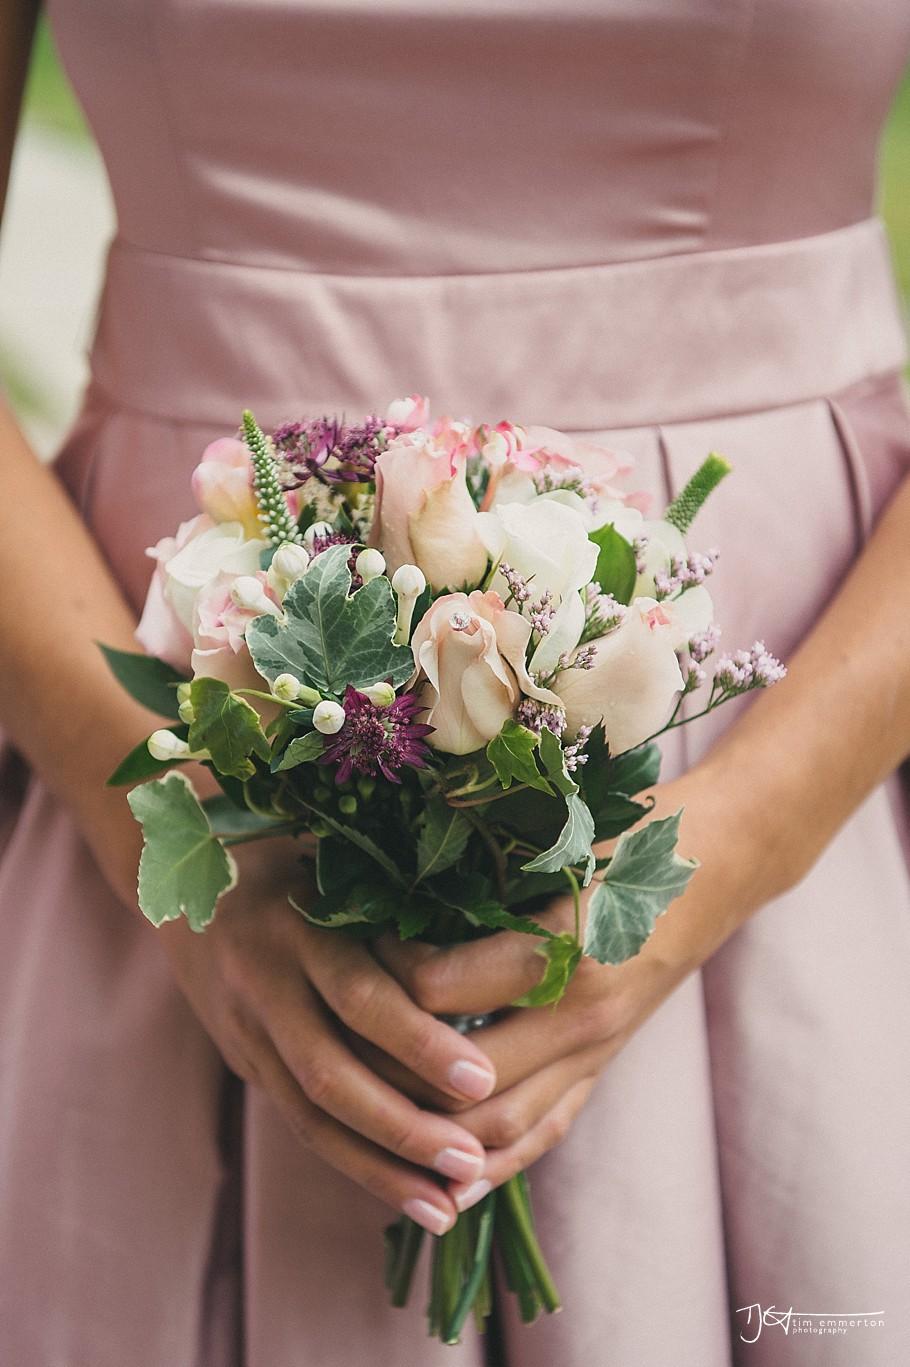 Samlesbury-Hall-Wedding-Photographer-062.jpg